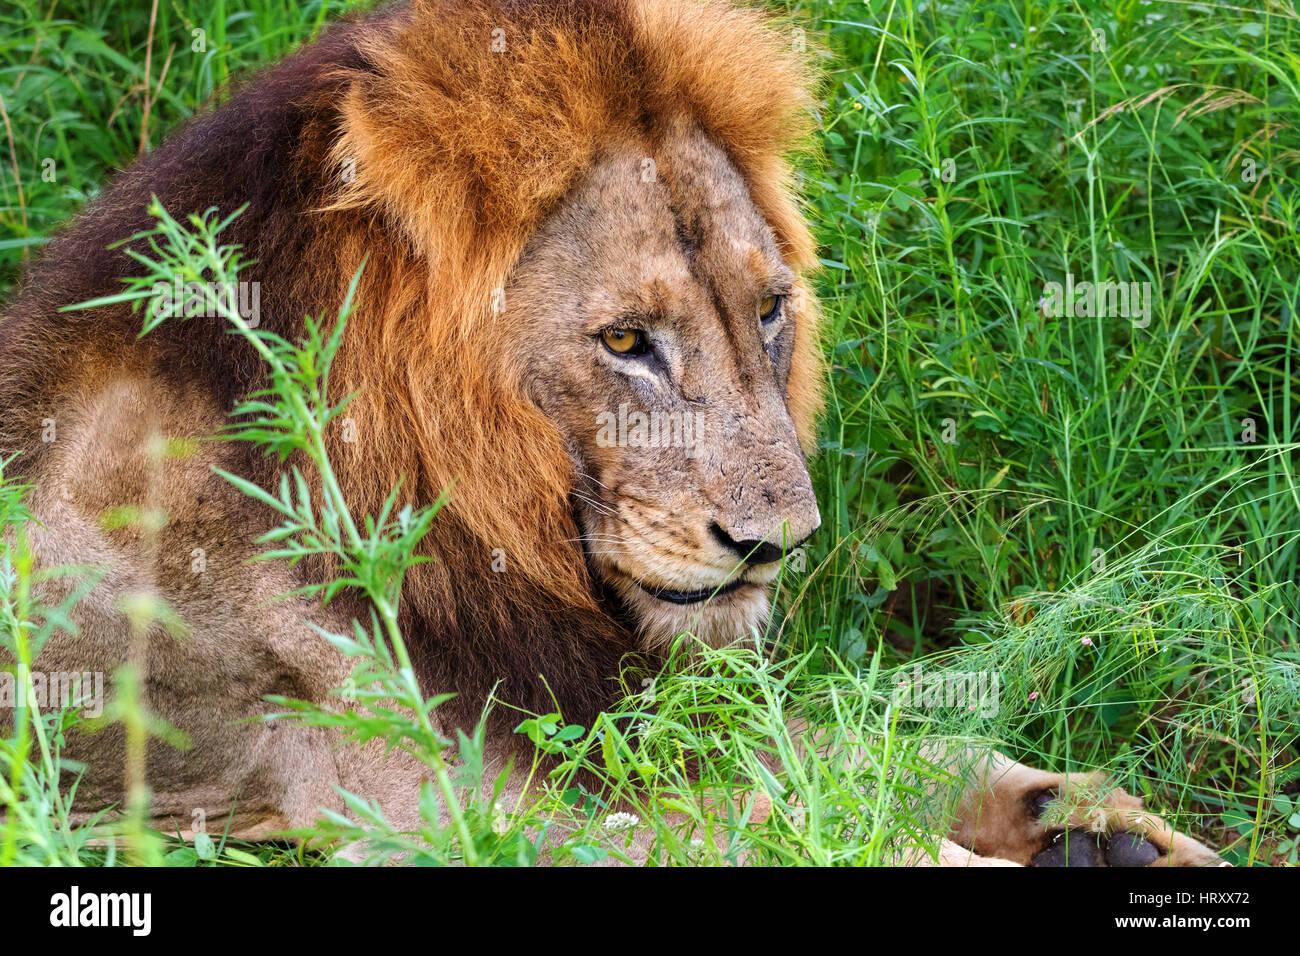 Vertical - Macho de León León de Transvaal (Panthera leo krugeri) también conocido como Southheast león africano, Foto de stock